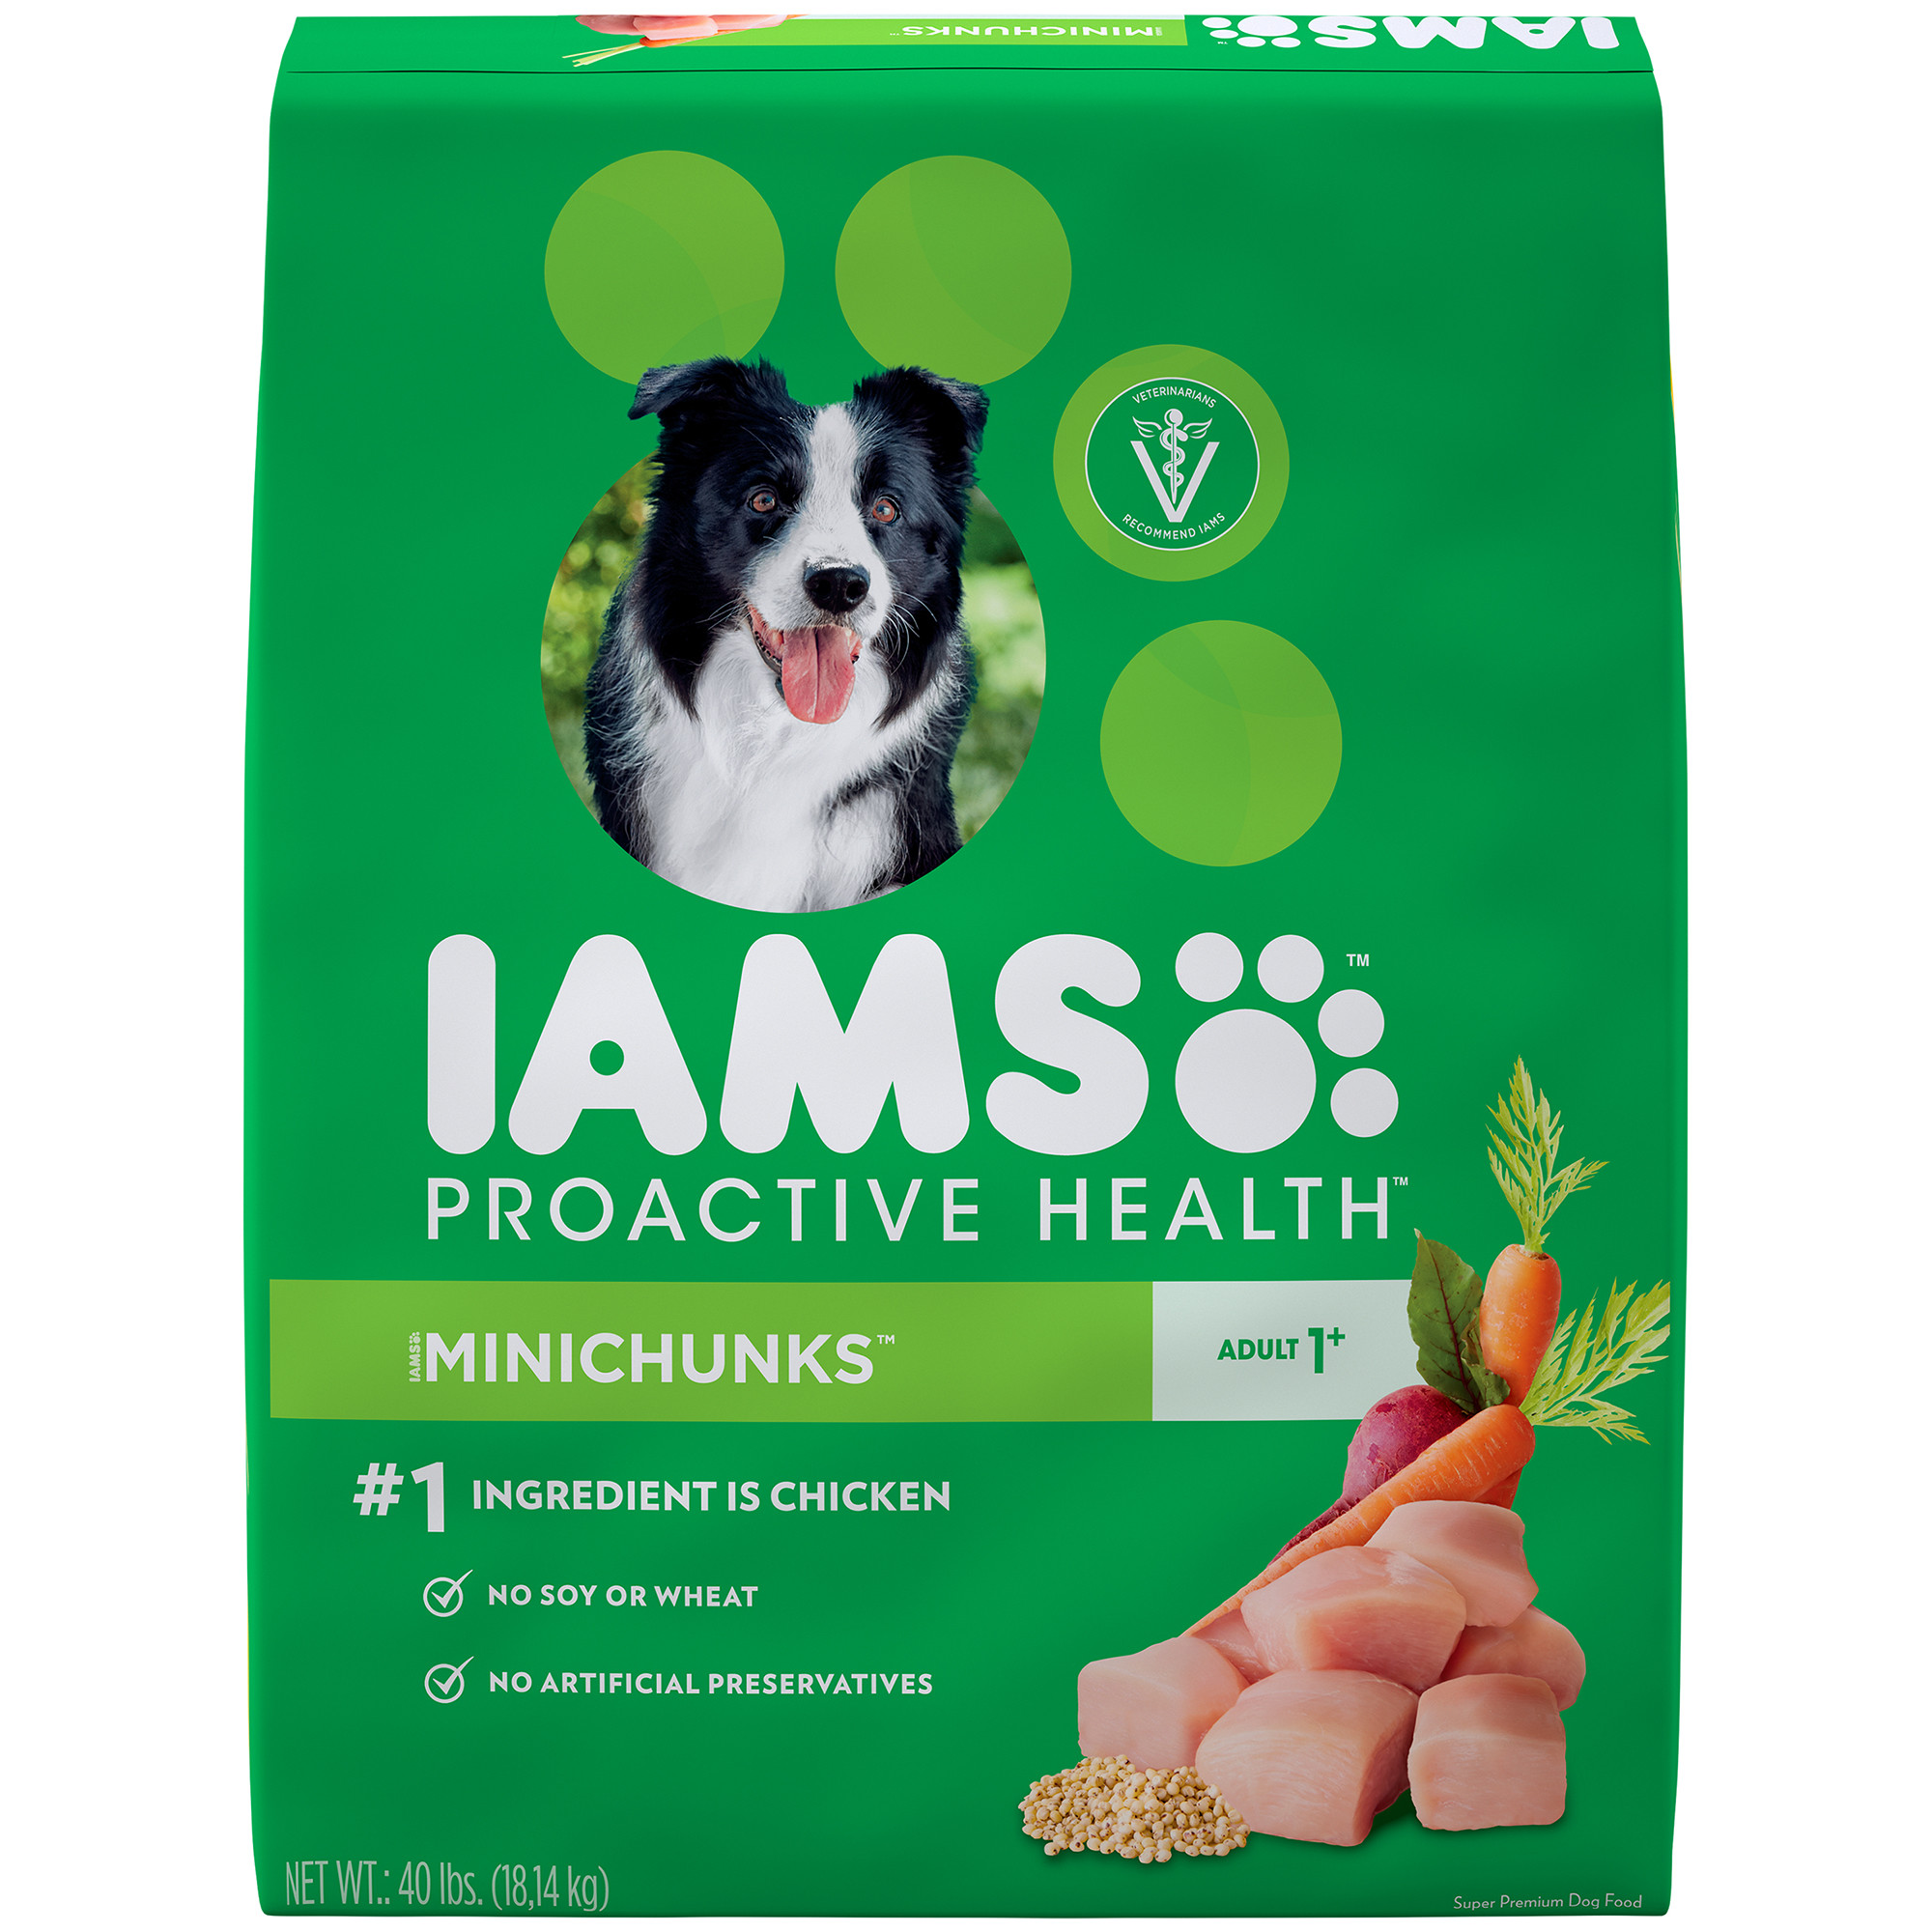 Iams Proactive Health Minichunks Chicken Dry Dog Food, 40 Lb